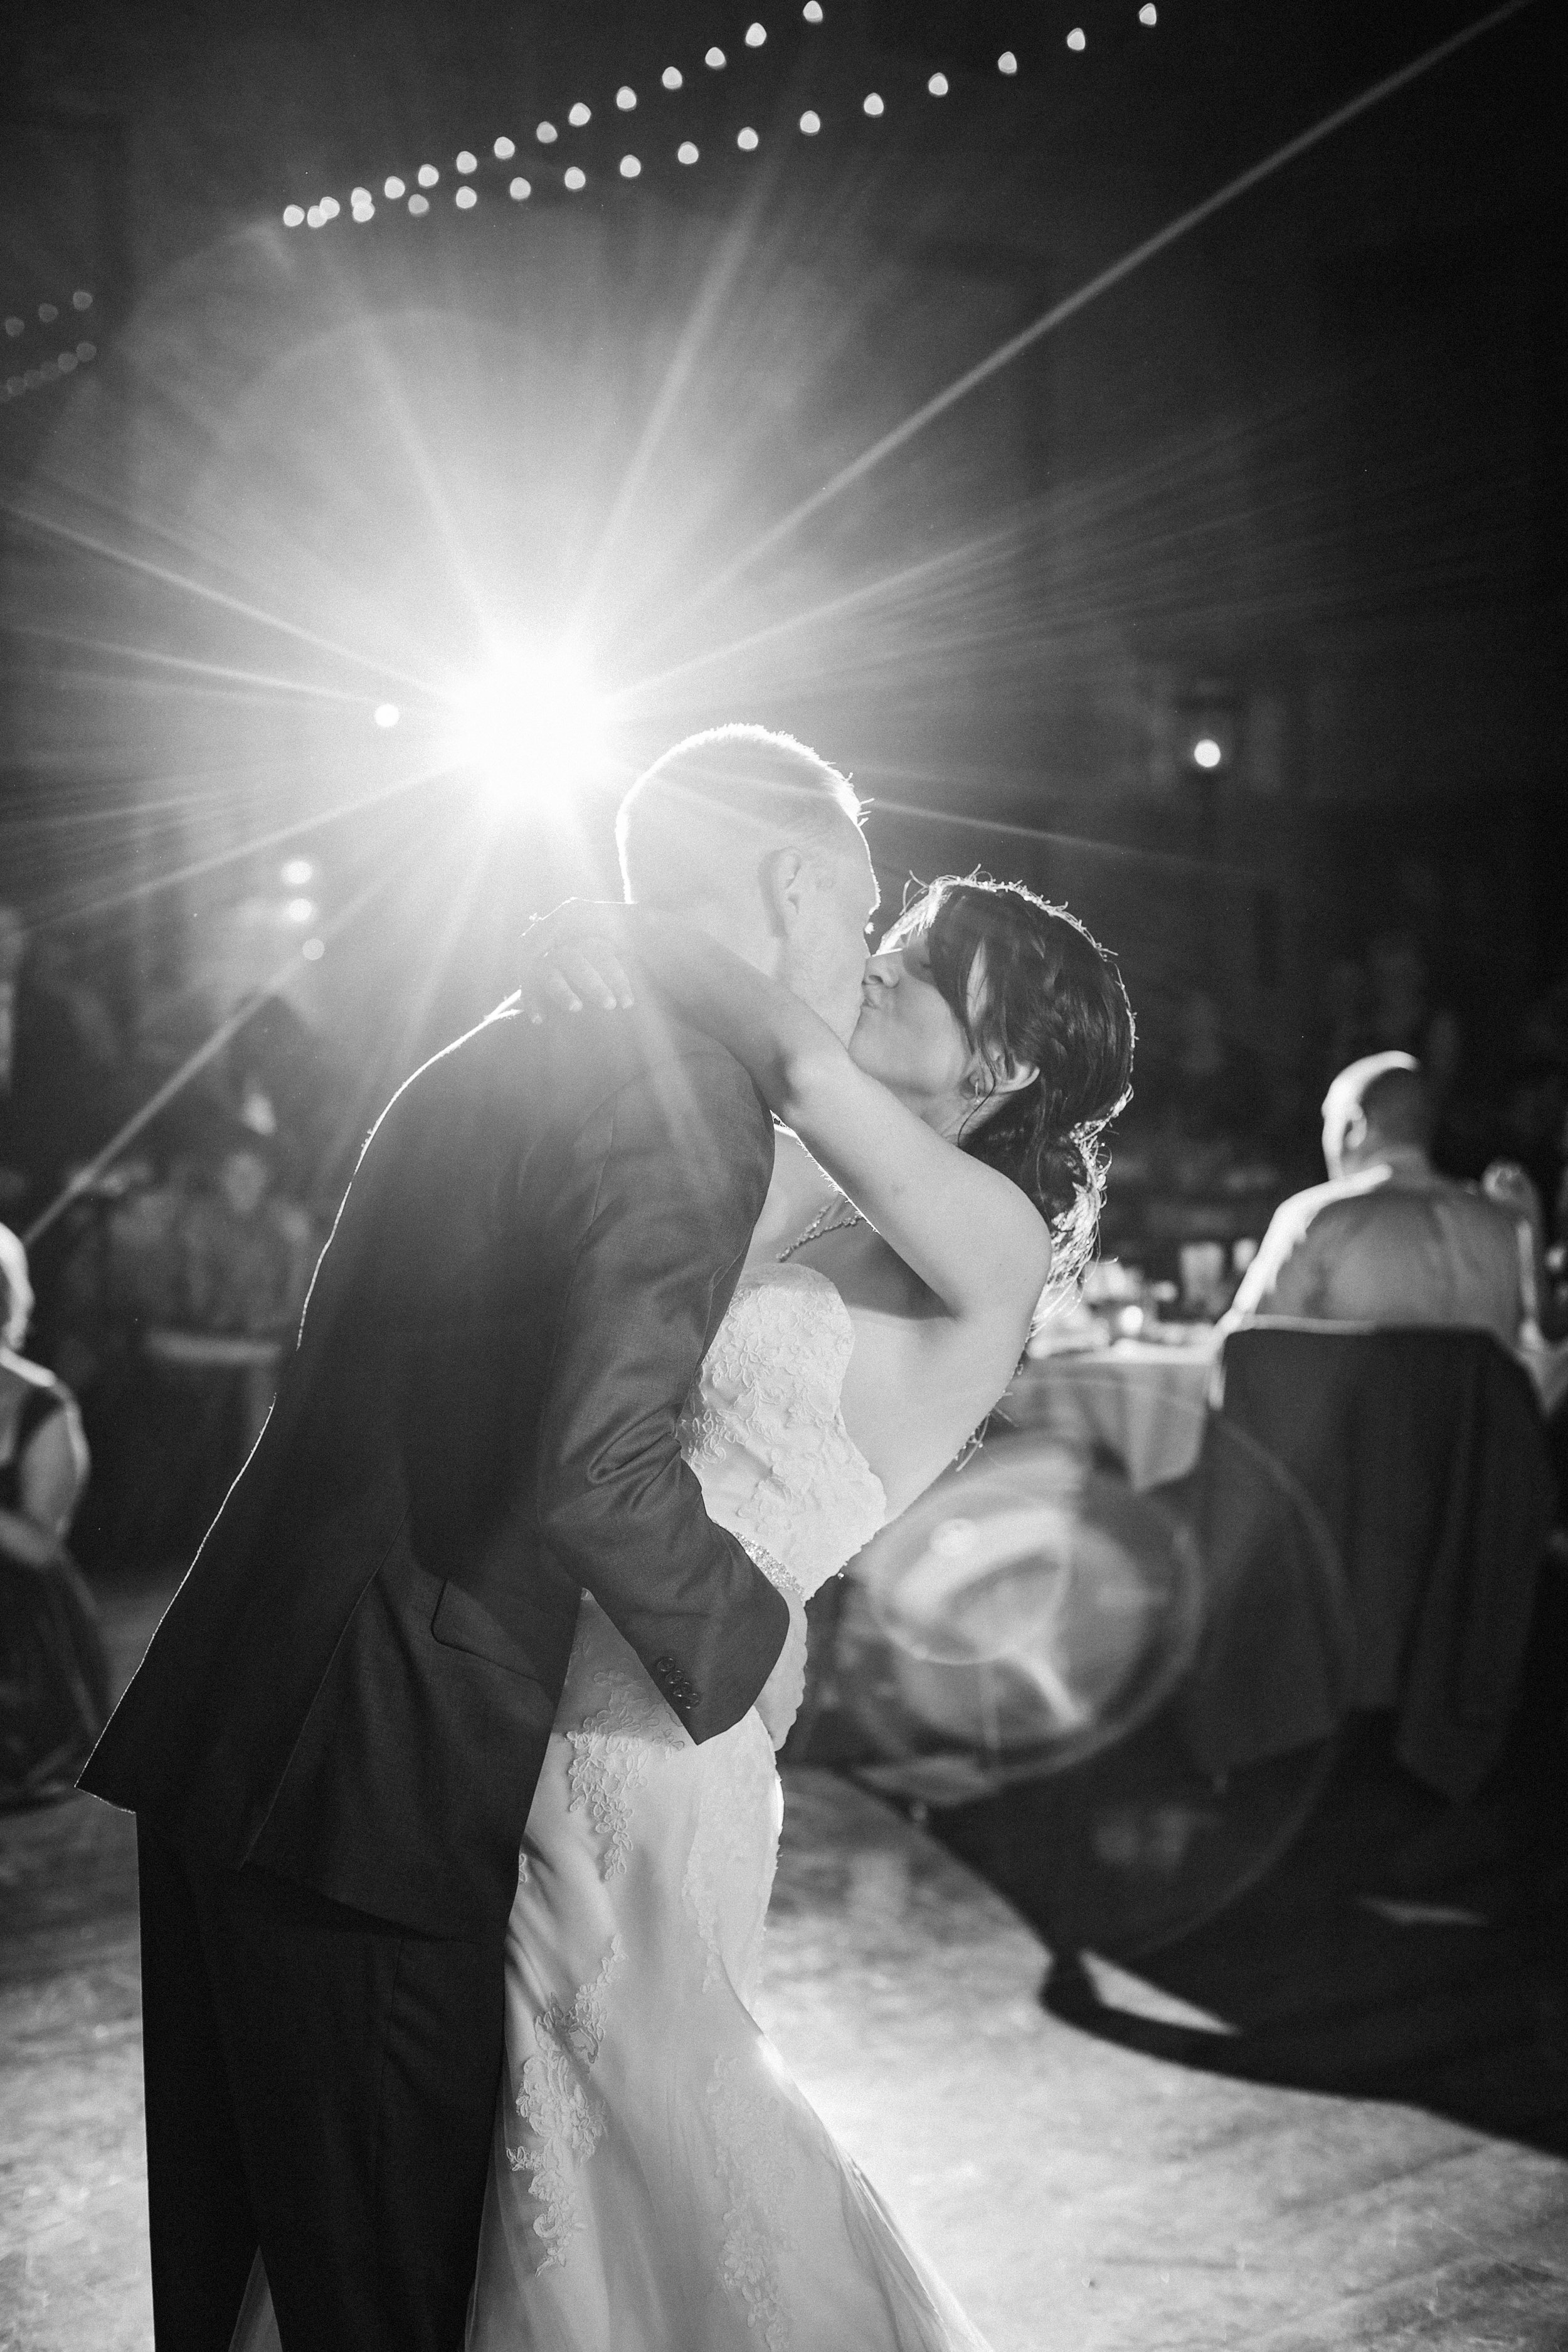 CourtneyIan_Wedding_Preview_0060.jpg